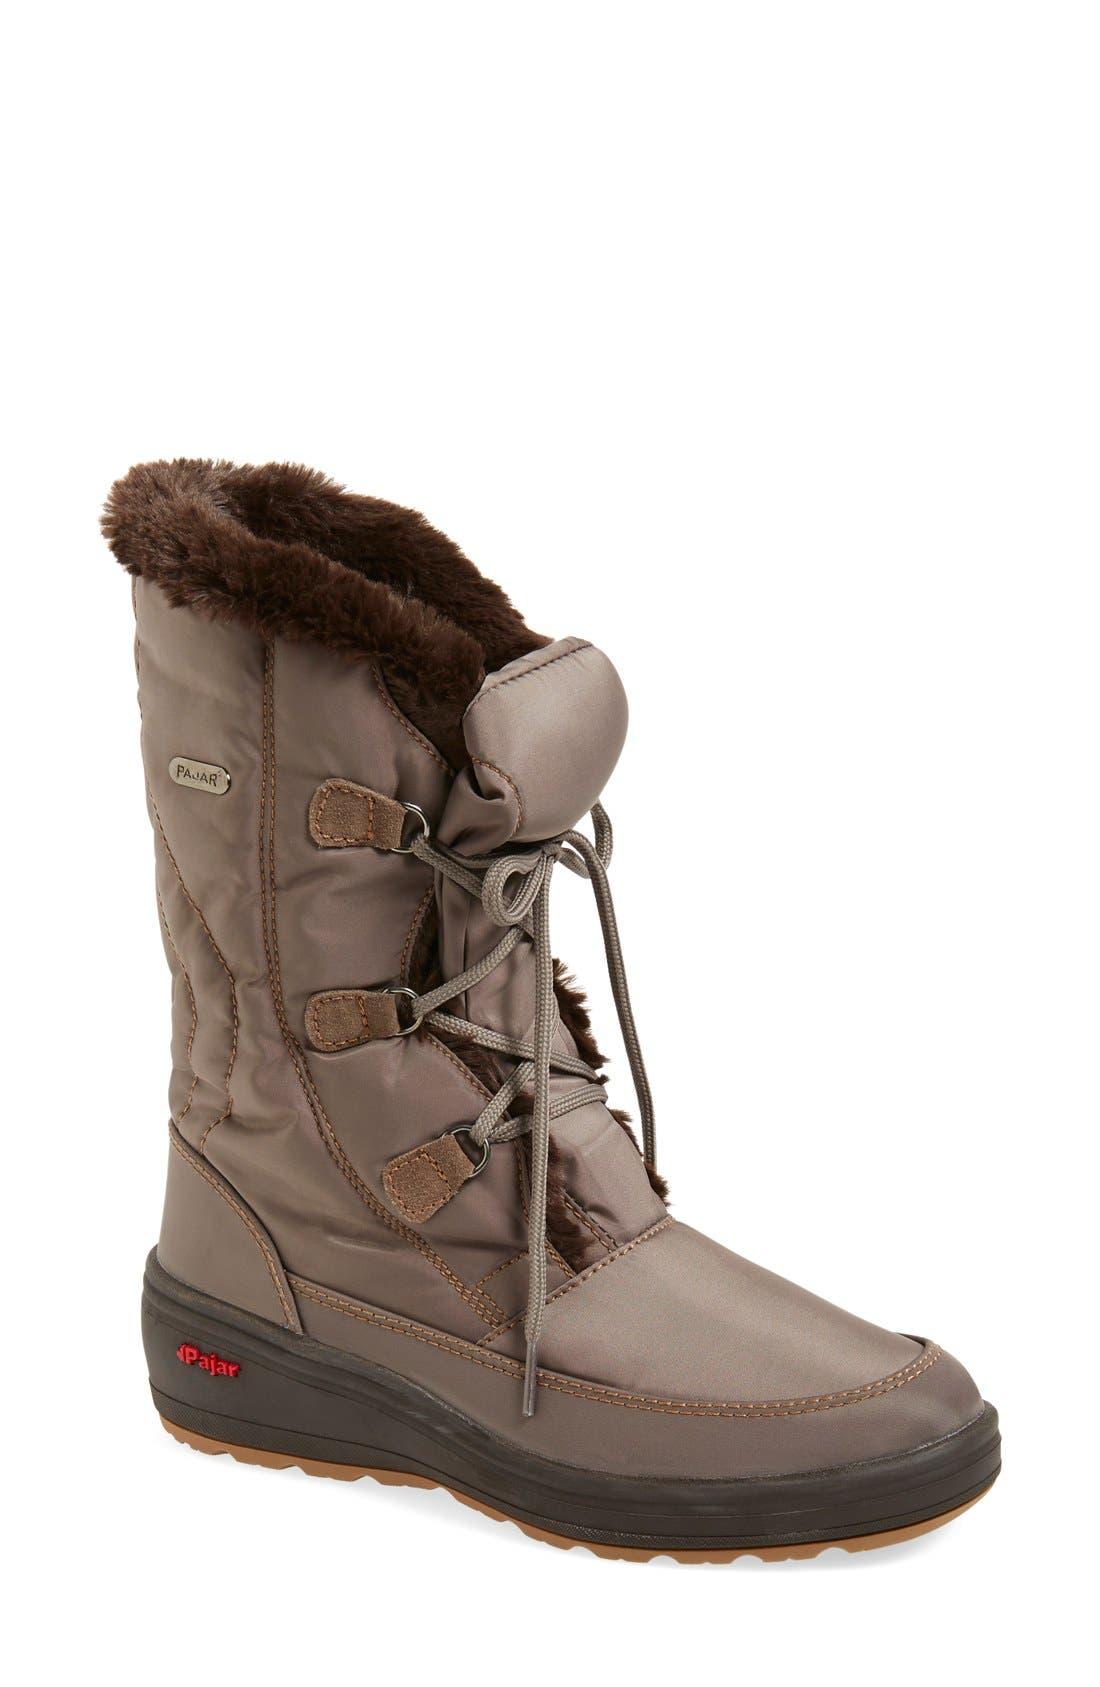 PAJAR 'Marcie' Waterproof Snow Boot with Faux Fur